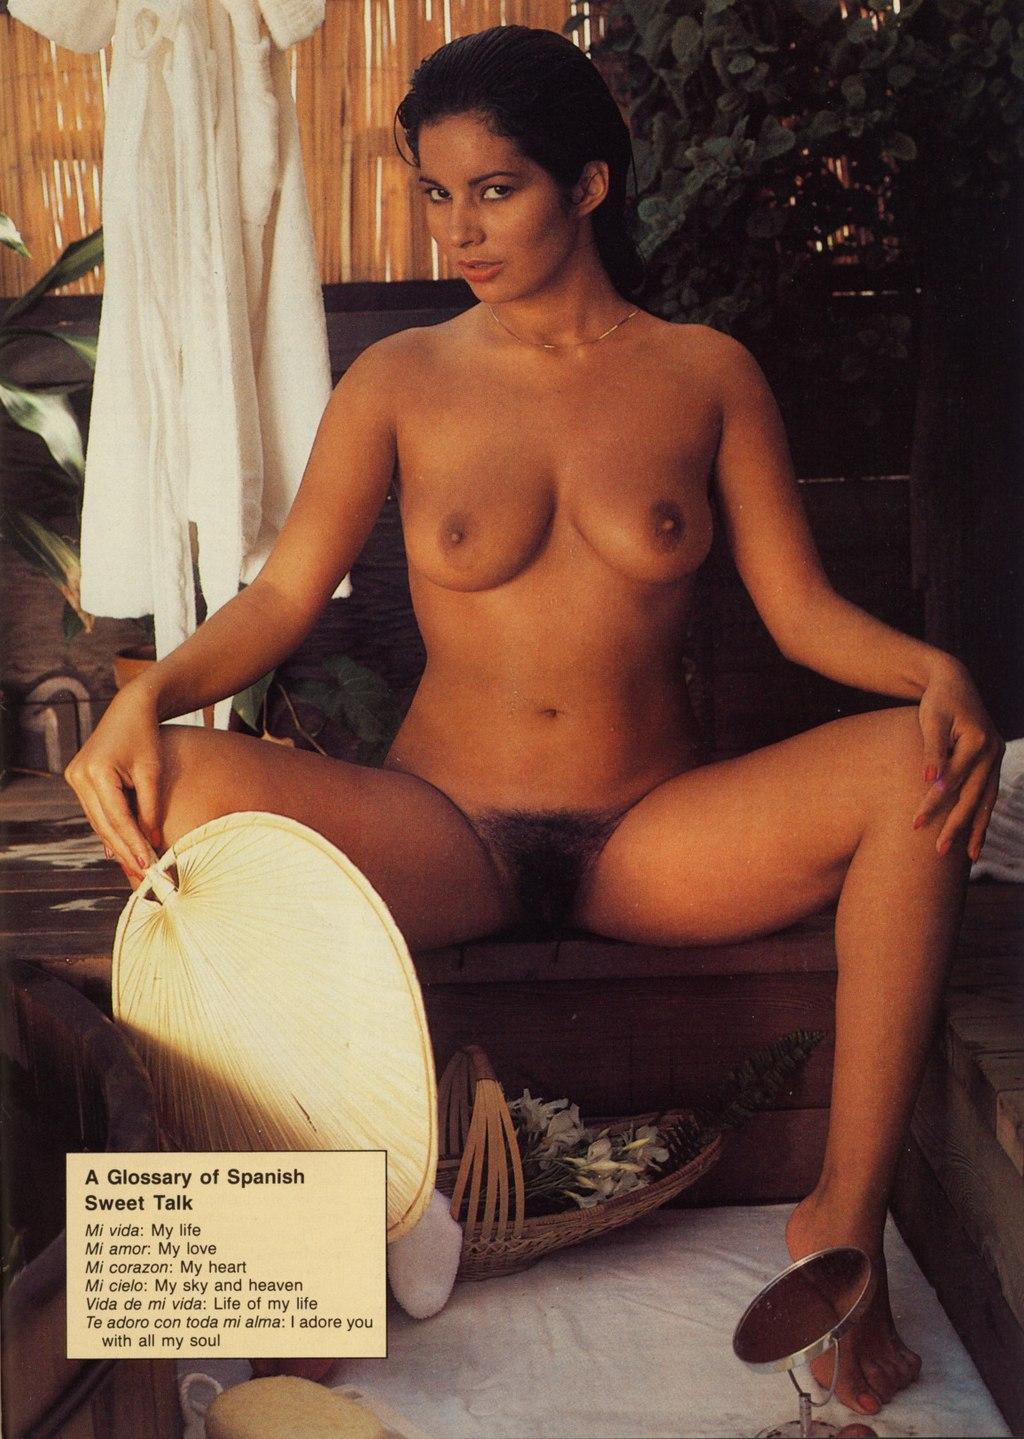 desi girl changing nude spycam pic